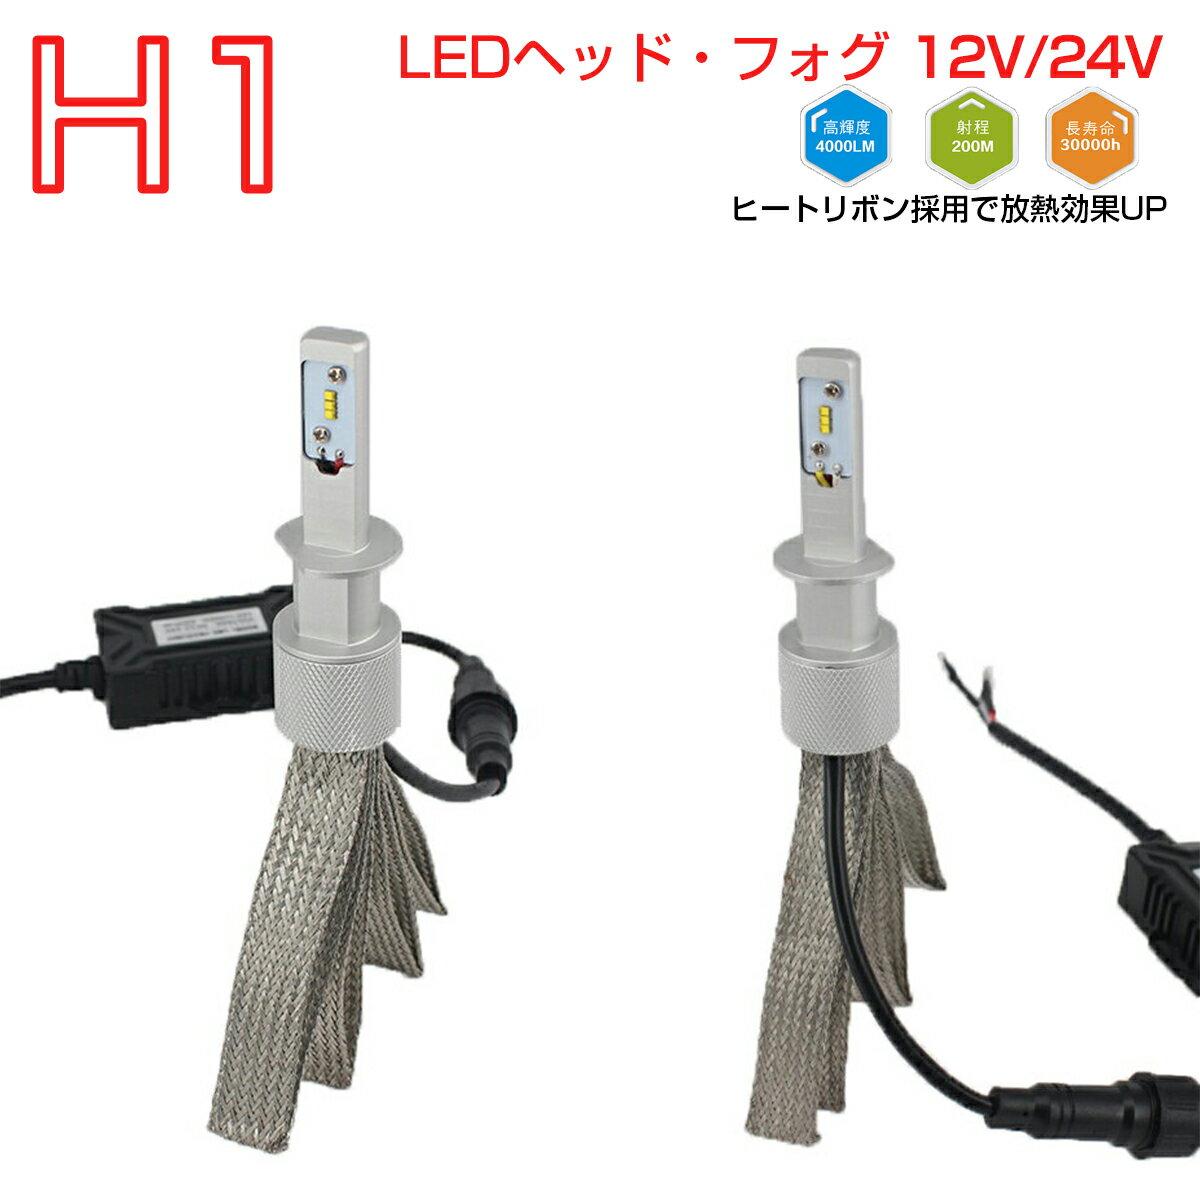 MITSUBISHI グランディス(minor後) H17.6〜H21.3 NA4W ヘッドライト(LO)[H1]白色 LED H1 LEDヘッドライト 2個入り 4000LM PHILIPS 12V 24V 6500K 宅配便送料無料 6ヶ月保証 K&M